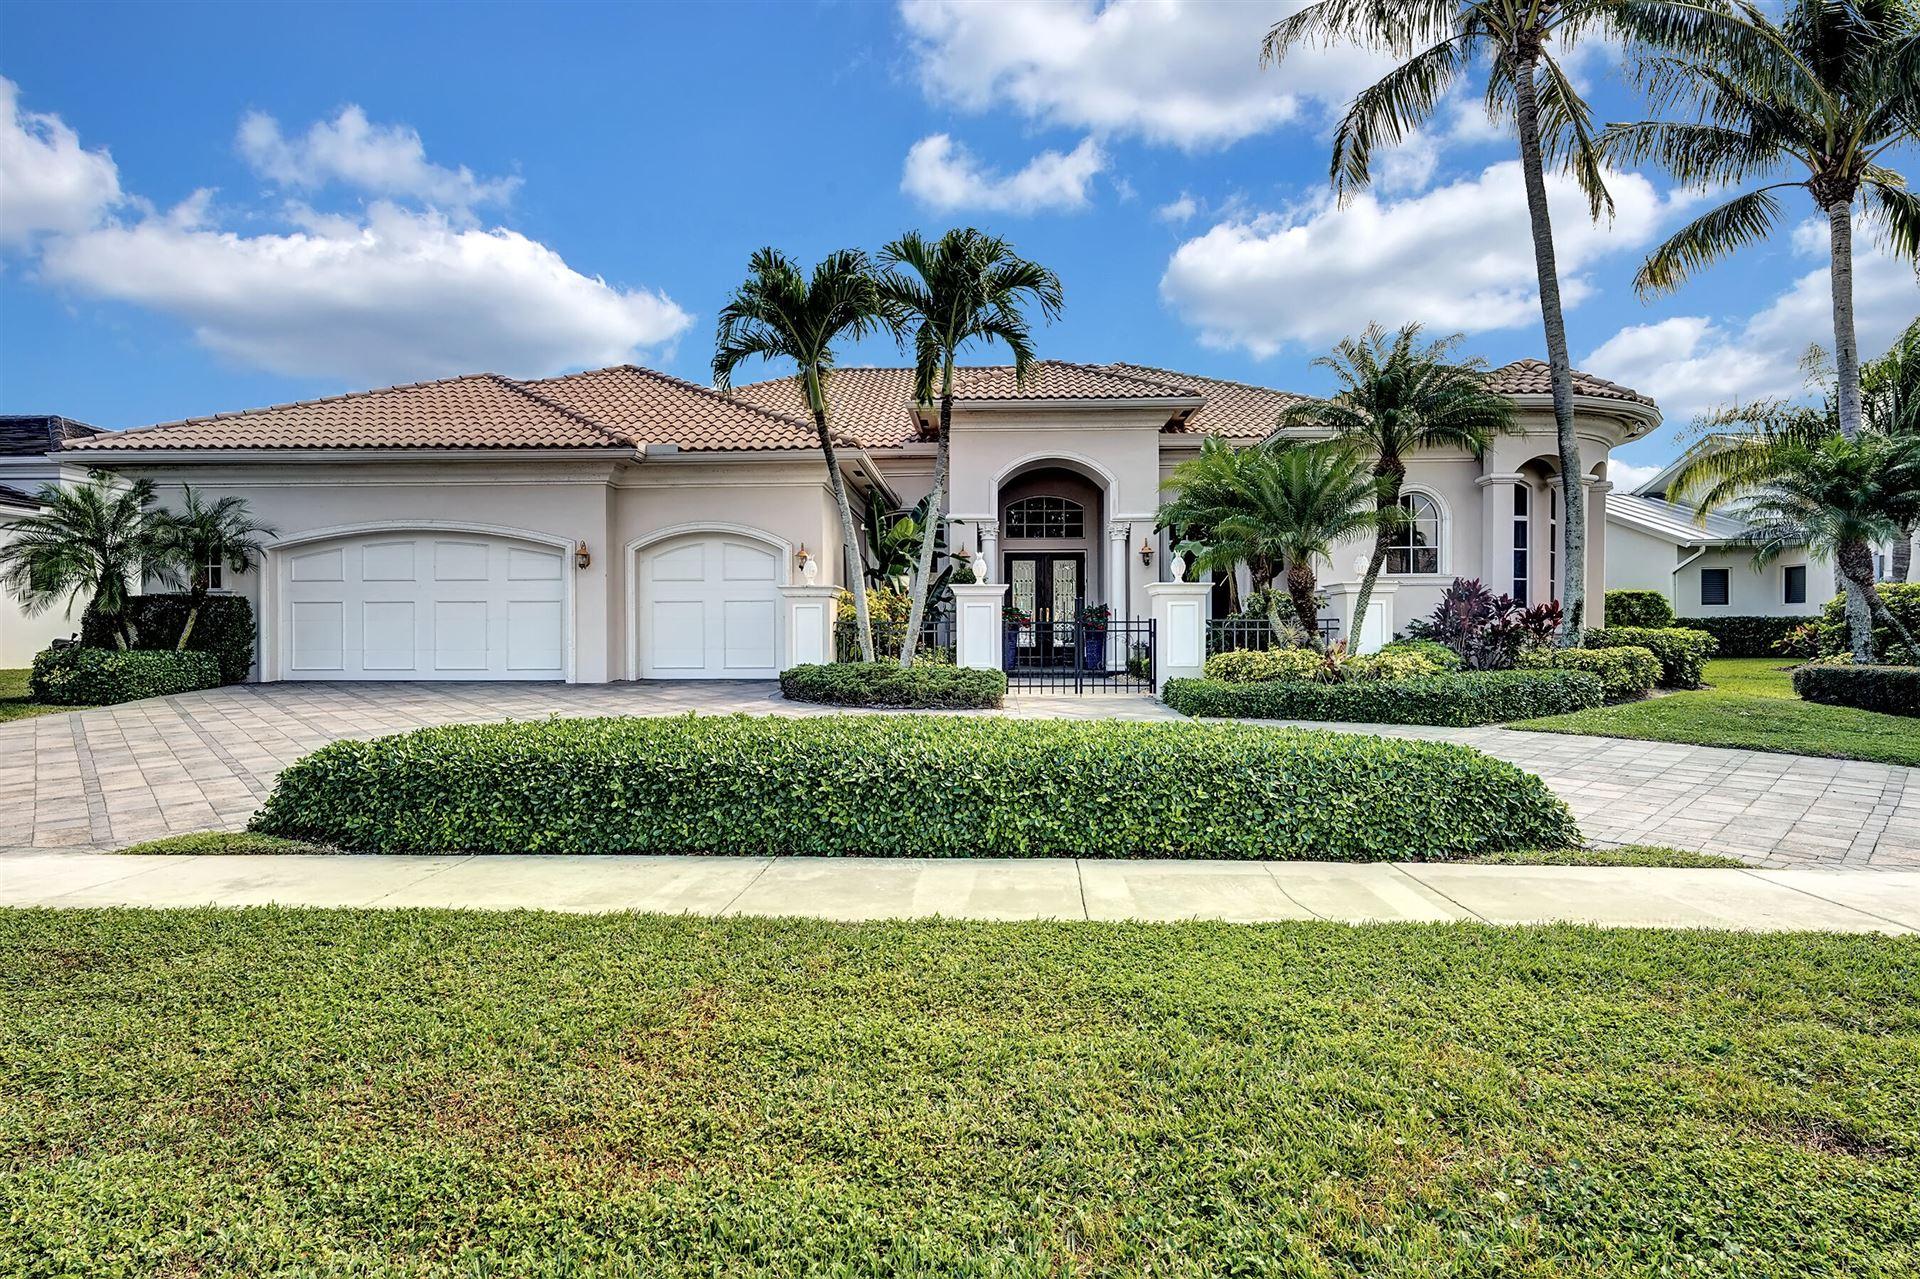 4820 Cherry Laurel Lane, Delray Beach, FL 33445 - MLS#: RX-10701030